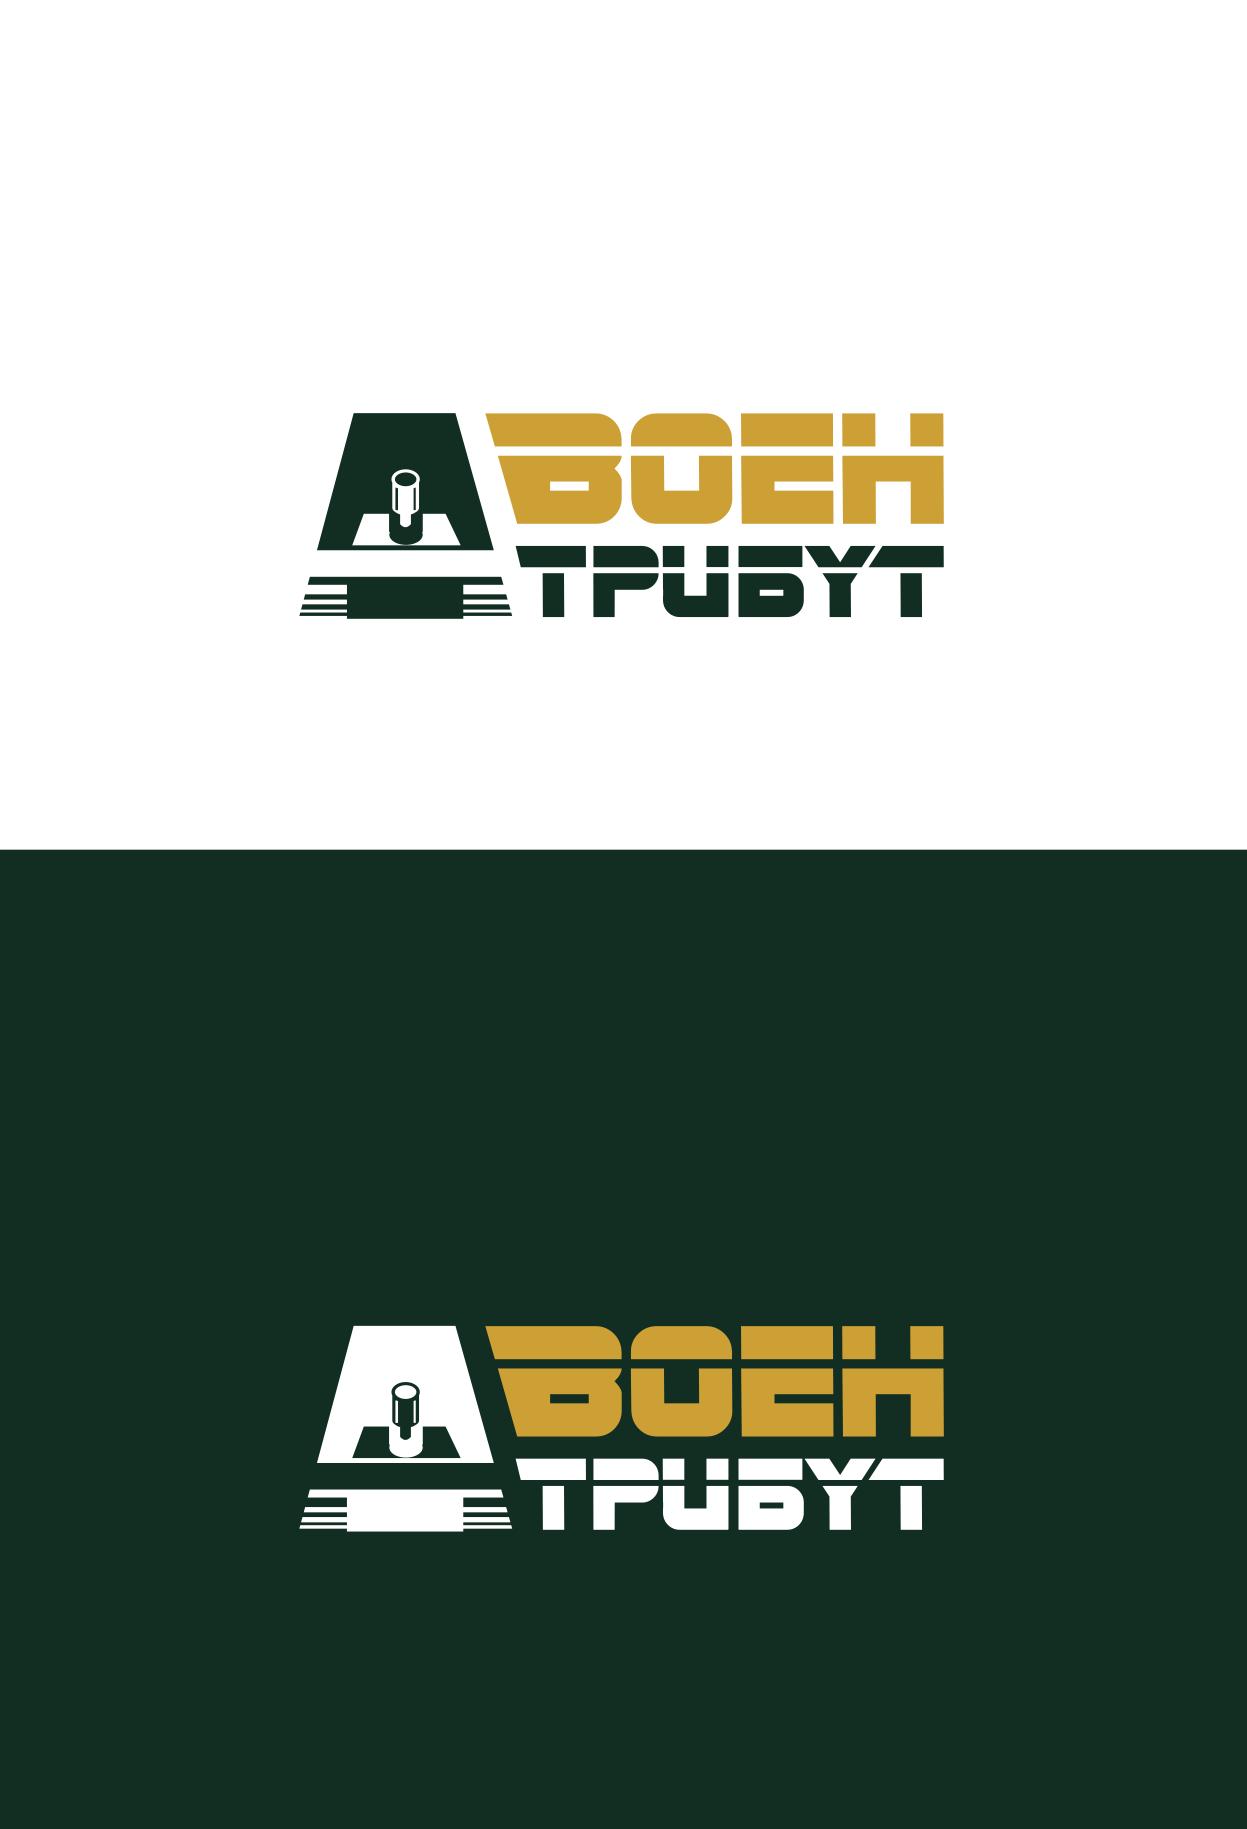 Разработка логотипа для компании военной тематики фото f_40460202733aa18b.png